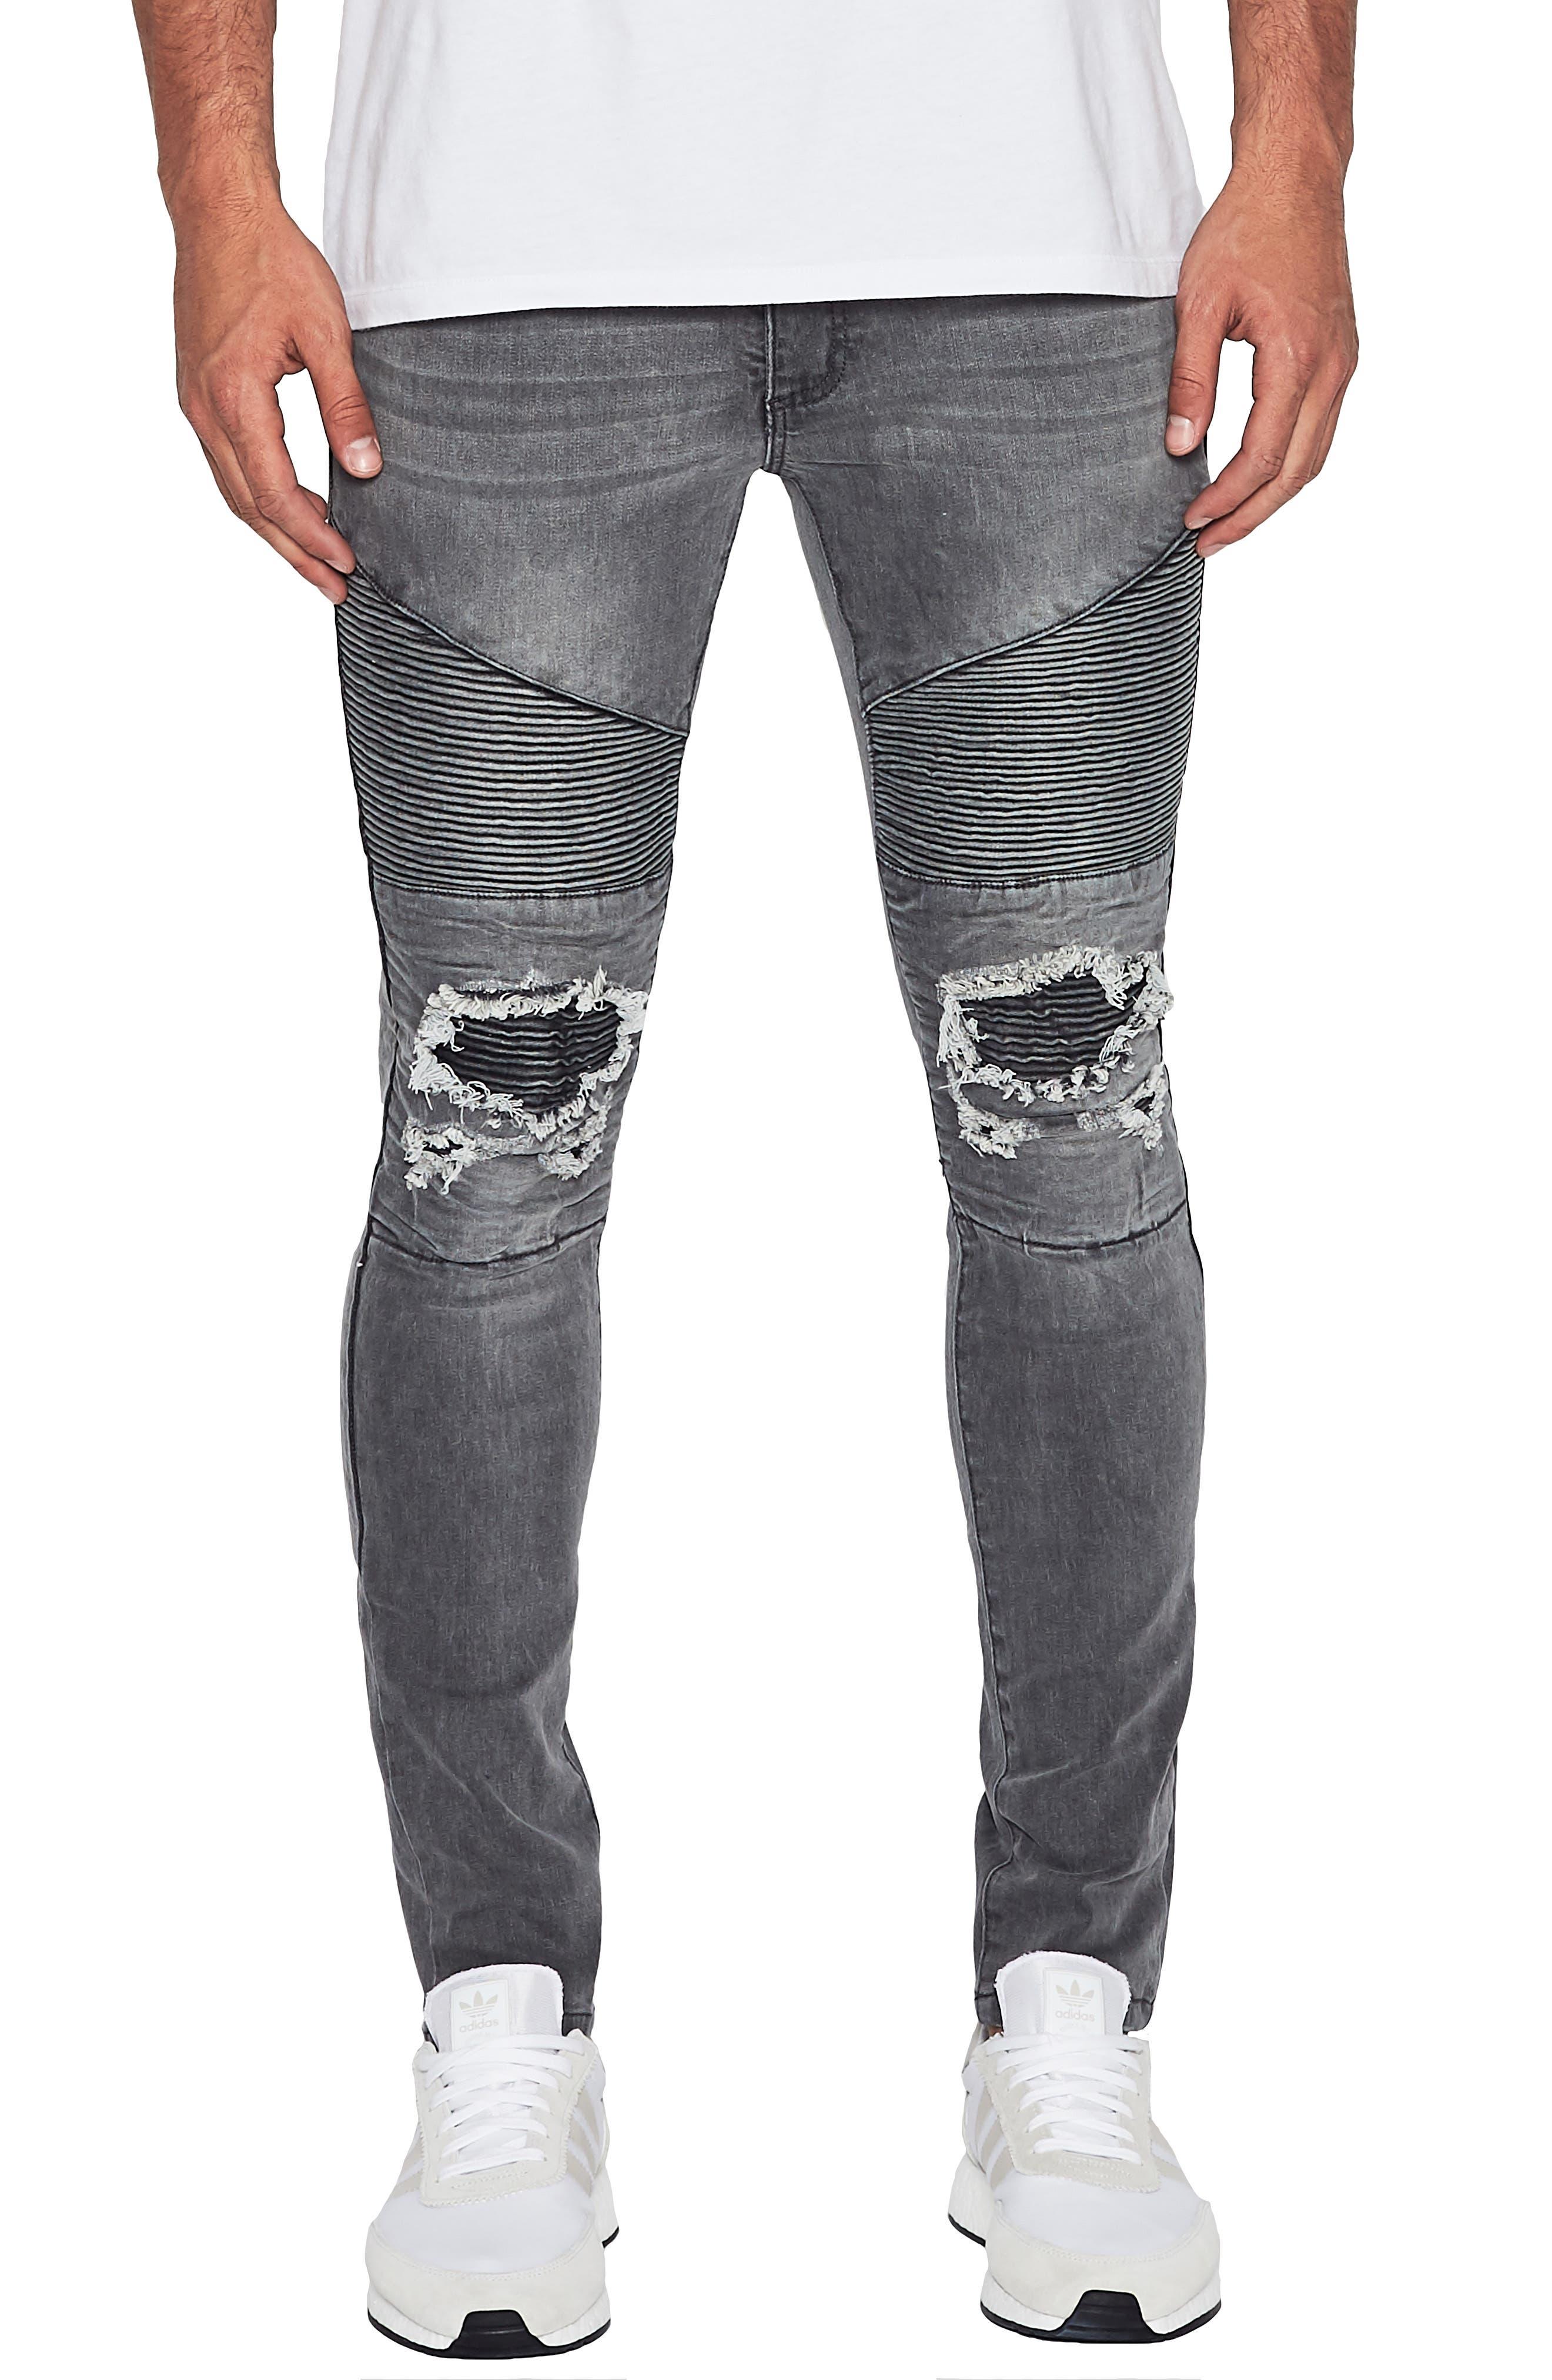 Combination Moto Skinny Moto Jeans,                             Main thumbnail 1, color,                             GREY TRASH